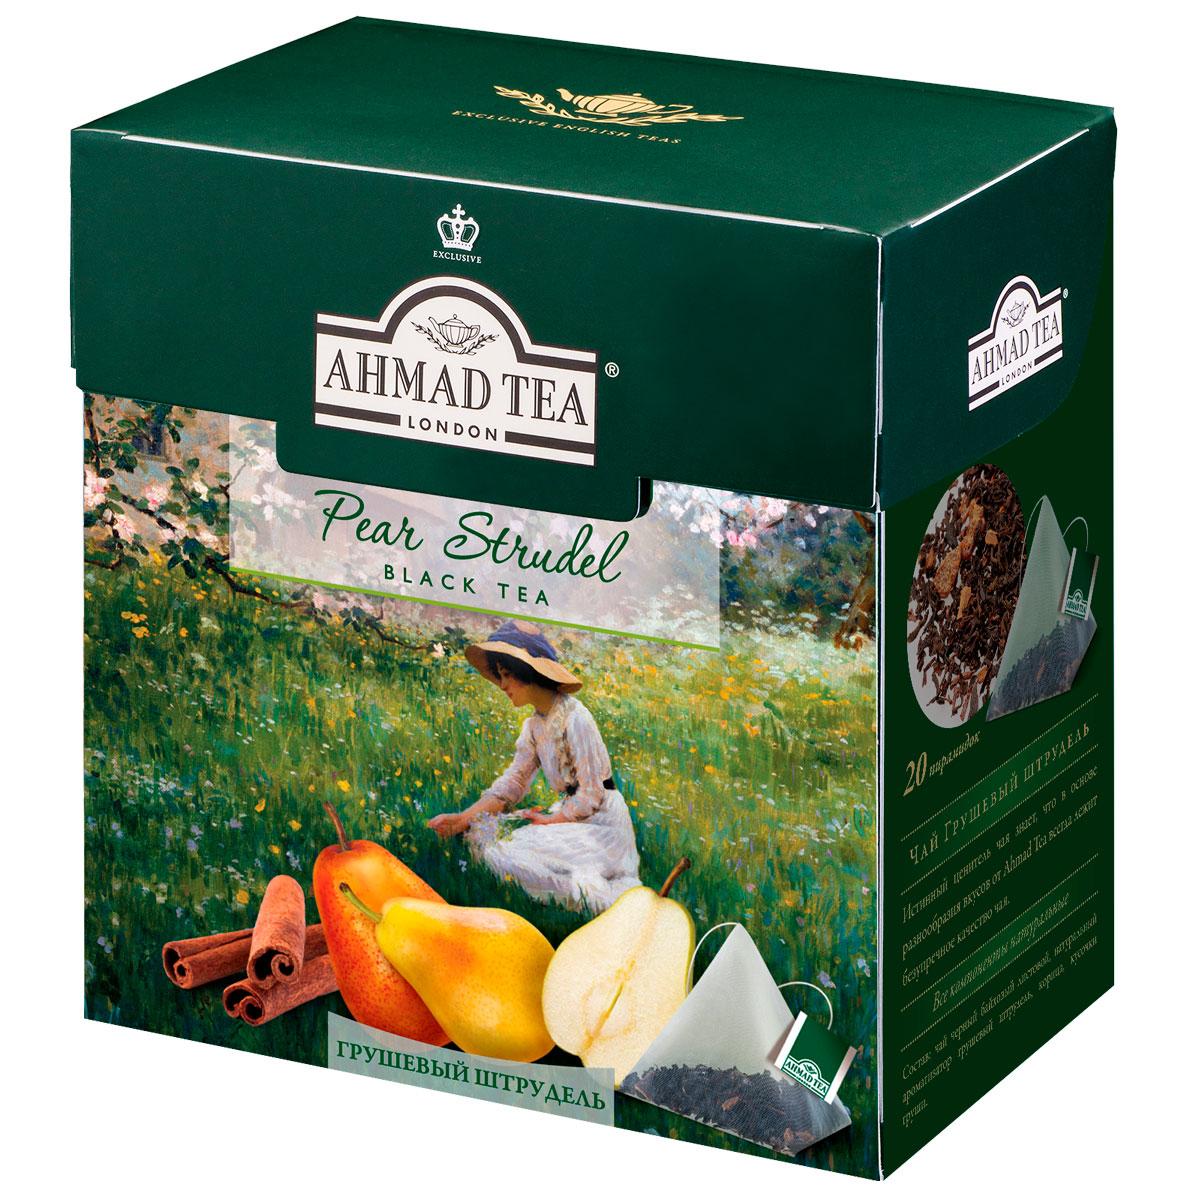 Ahmad Tea Pear Strudel черный чай в пирамидках, 20 шт ahmad tea weekend collection набор чая в пирамидках 3 вкуса 108 г